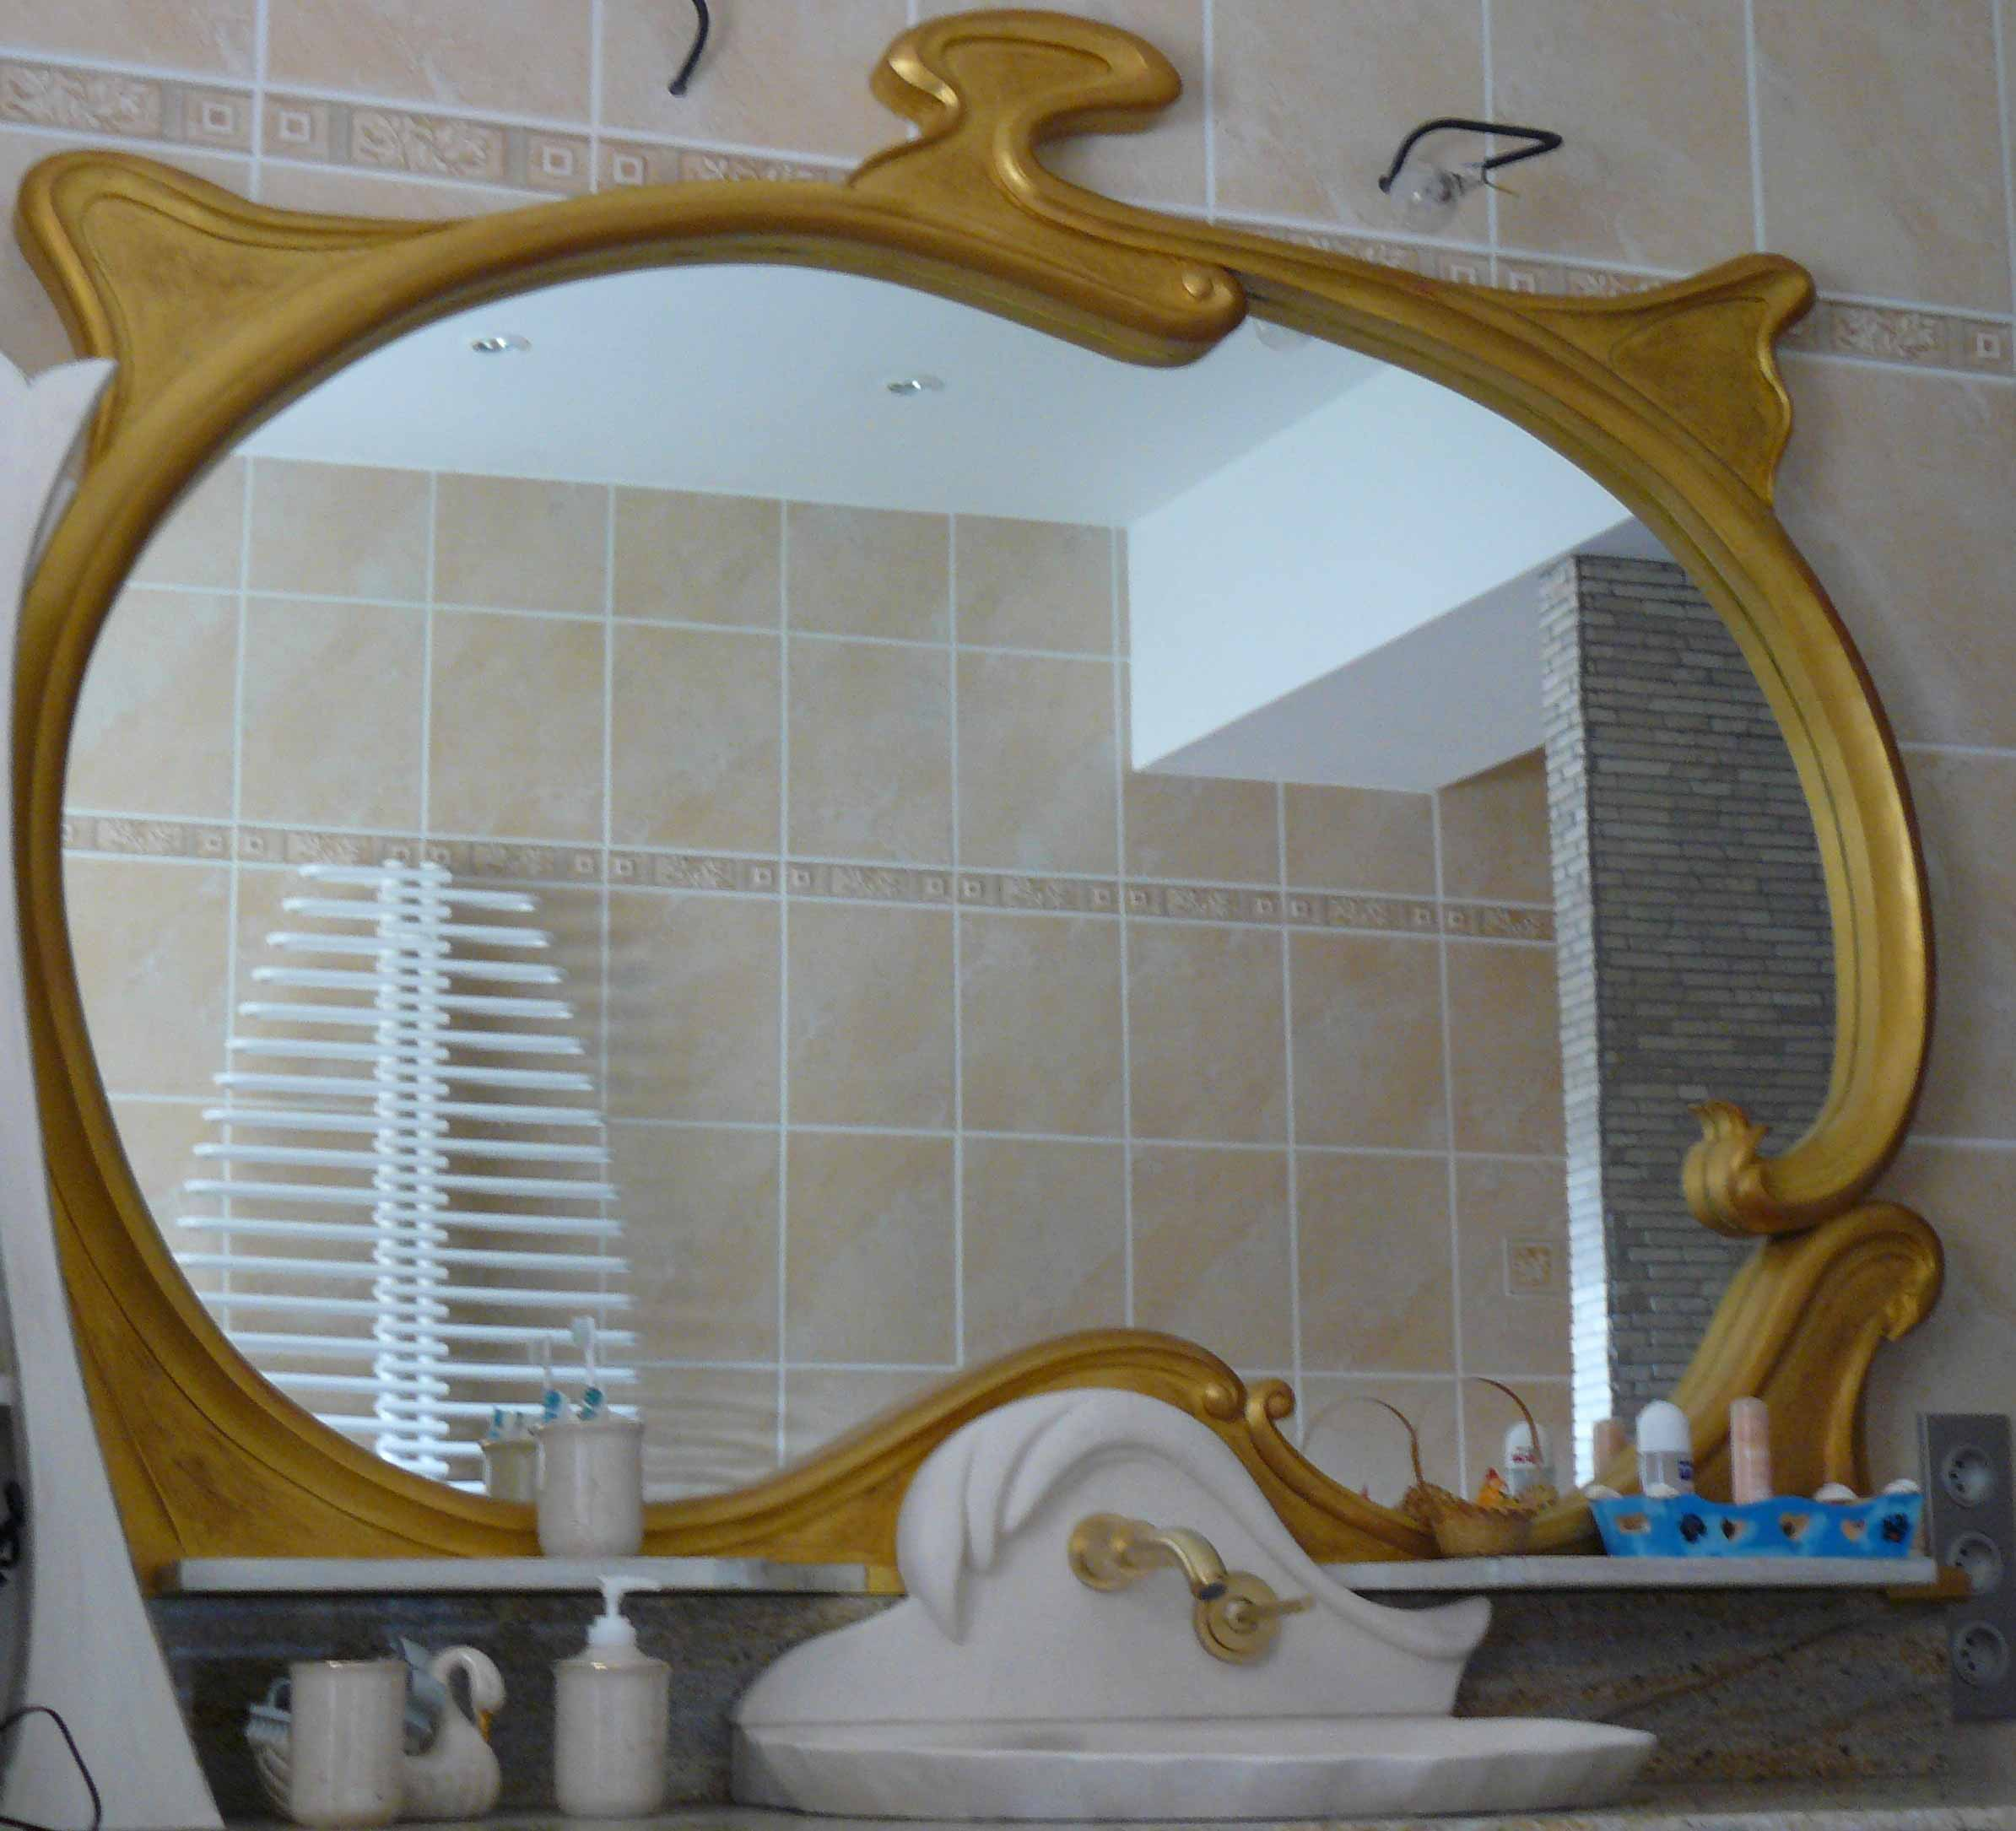 Commande personnalisée de miroir de salle de bain